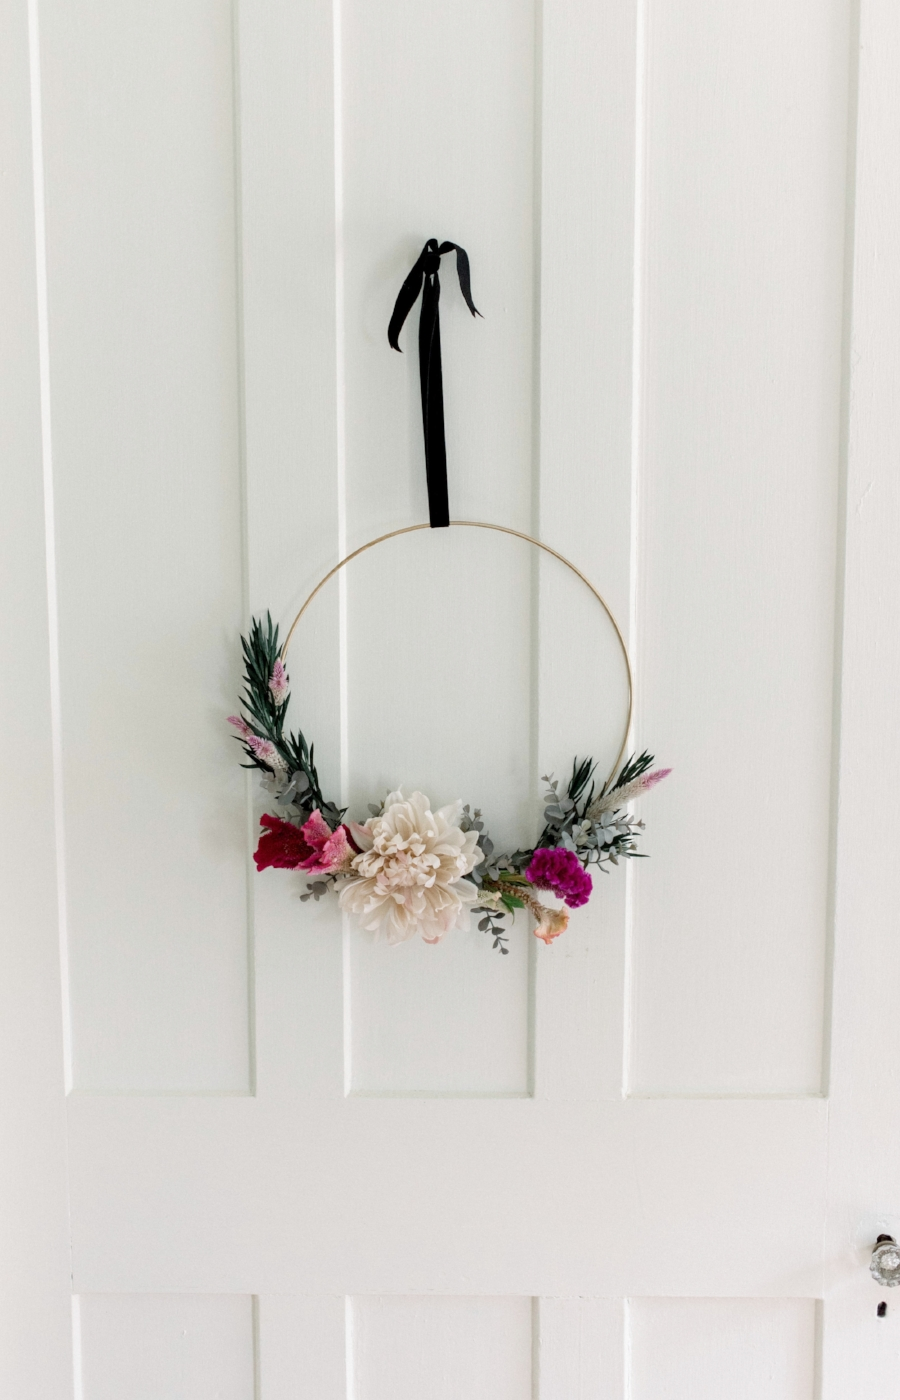 Diy fall wreath by Skaneateles Interior Designer Teaselwood Design